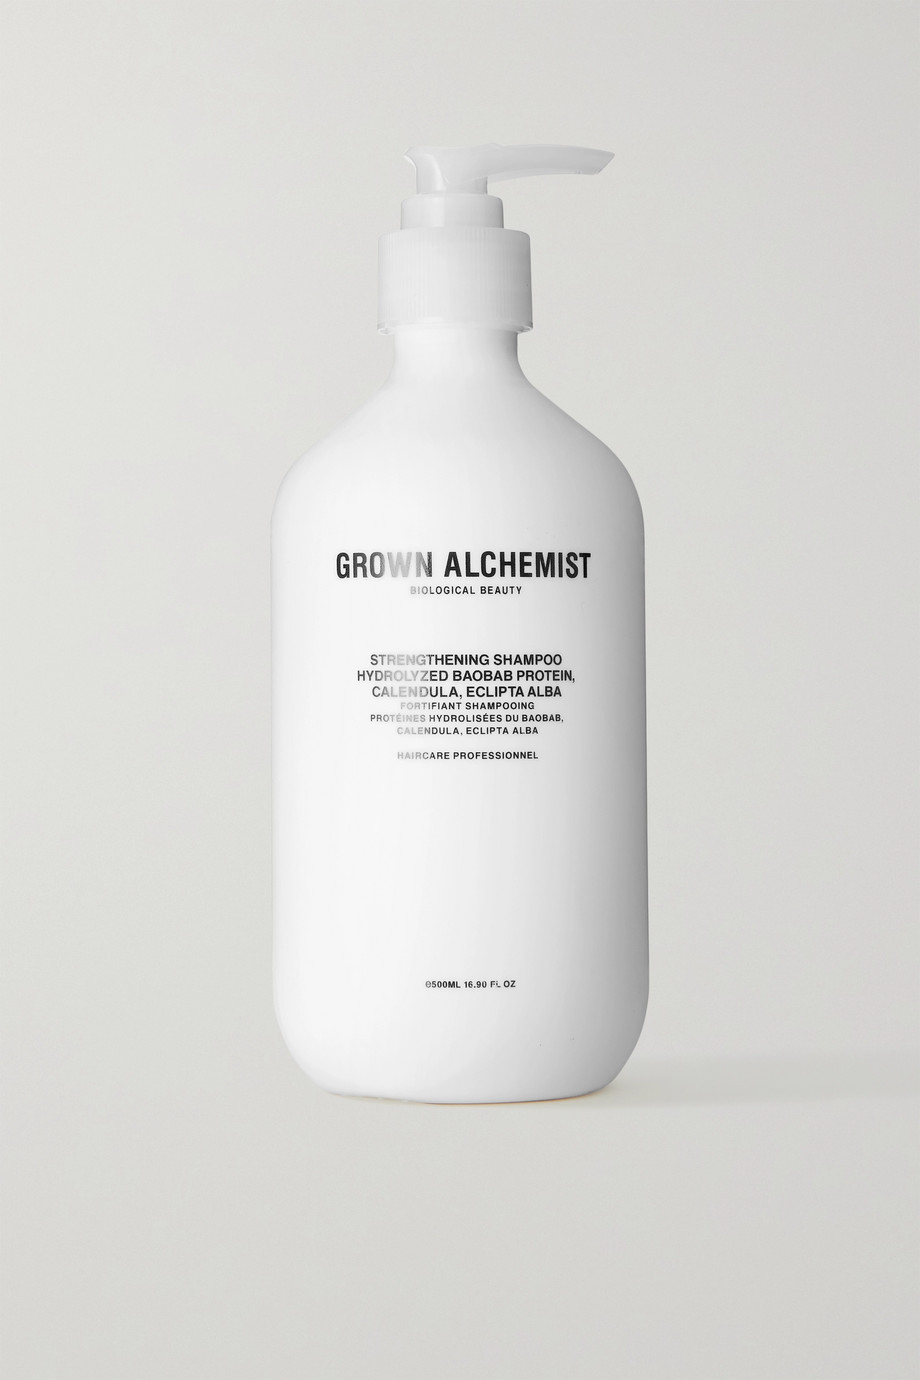 Grown Alchemist Strengthening – Shampoo 0.2, 500 ml – Shampoo